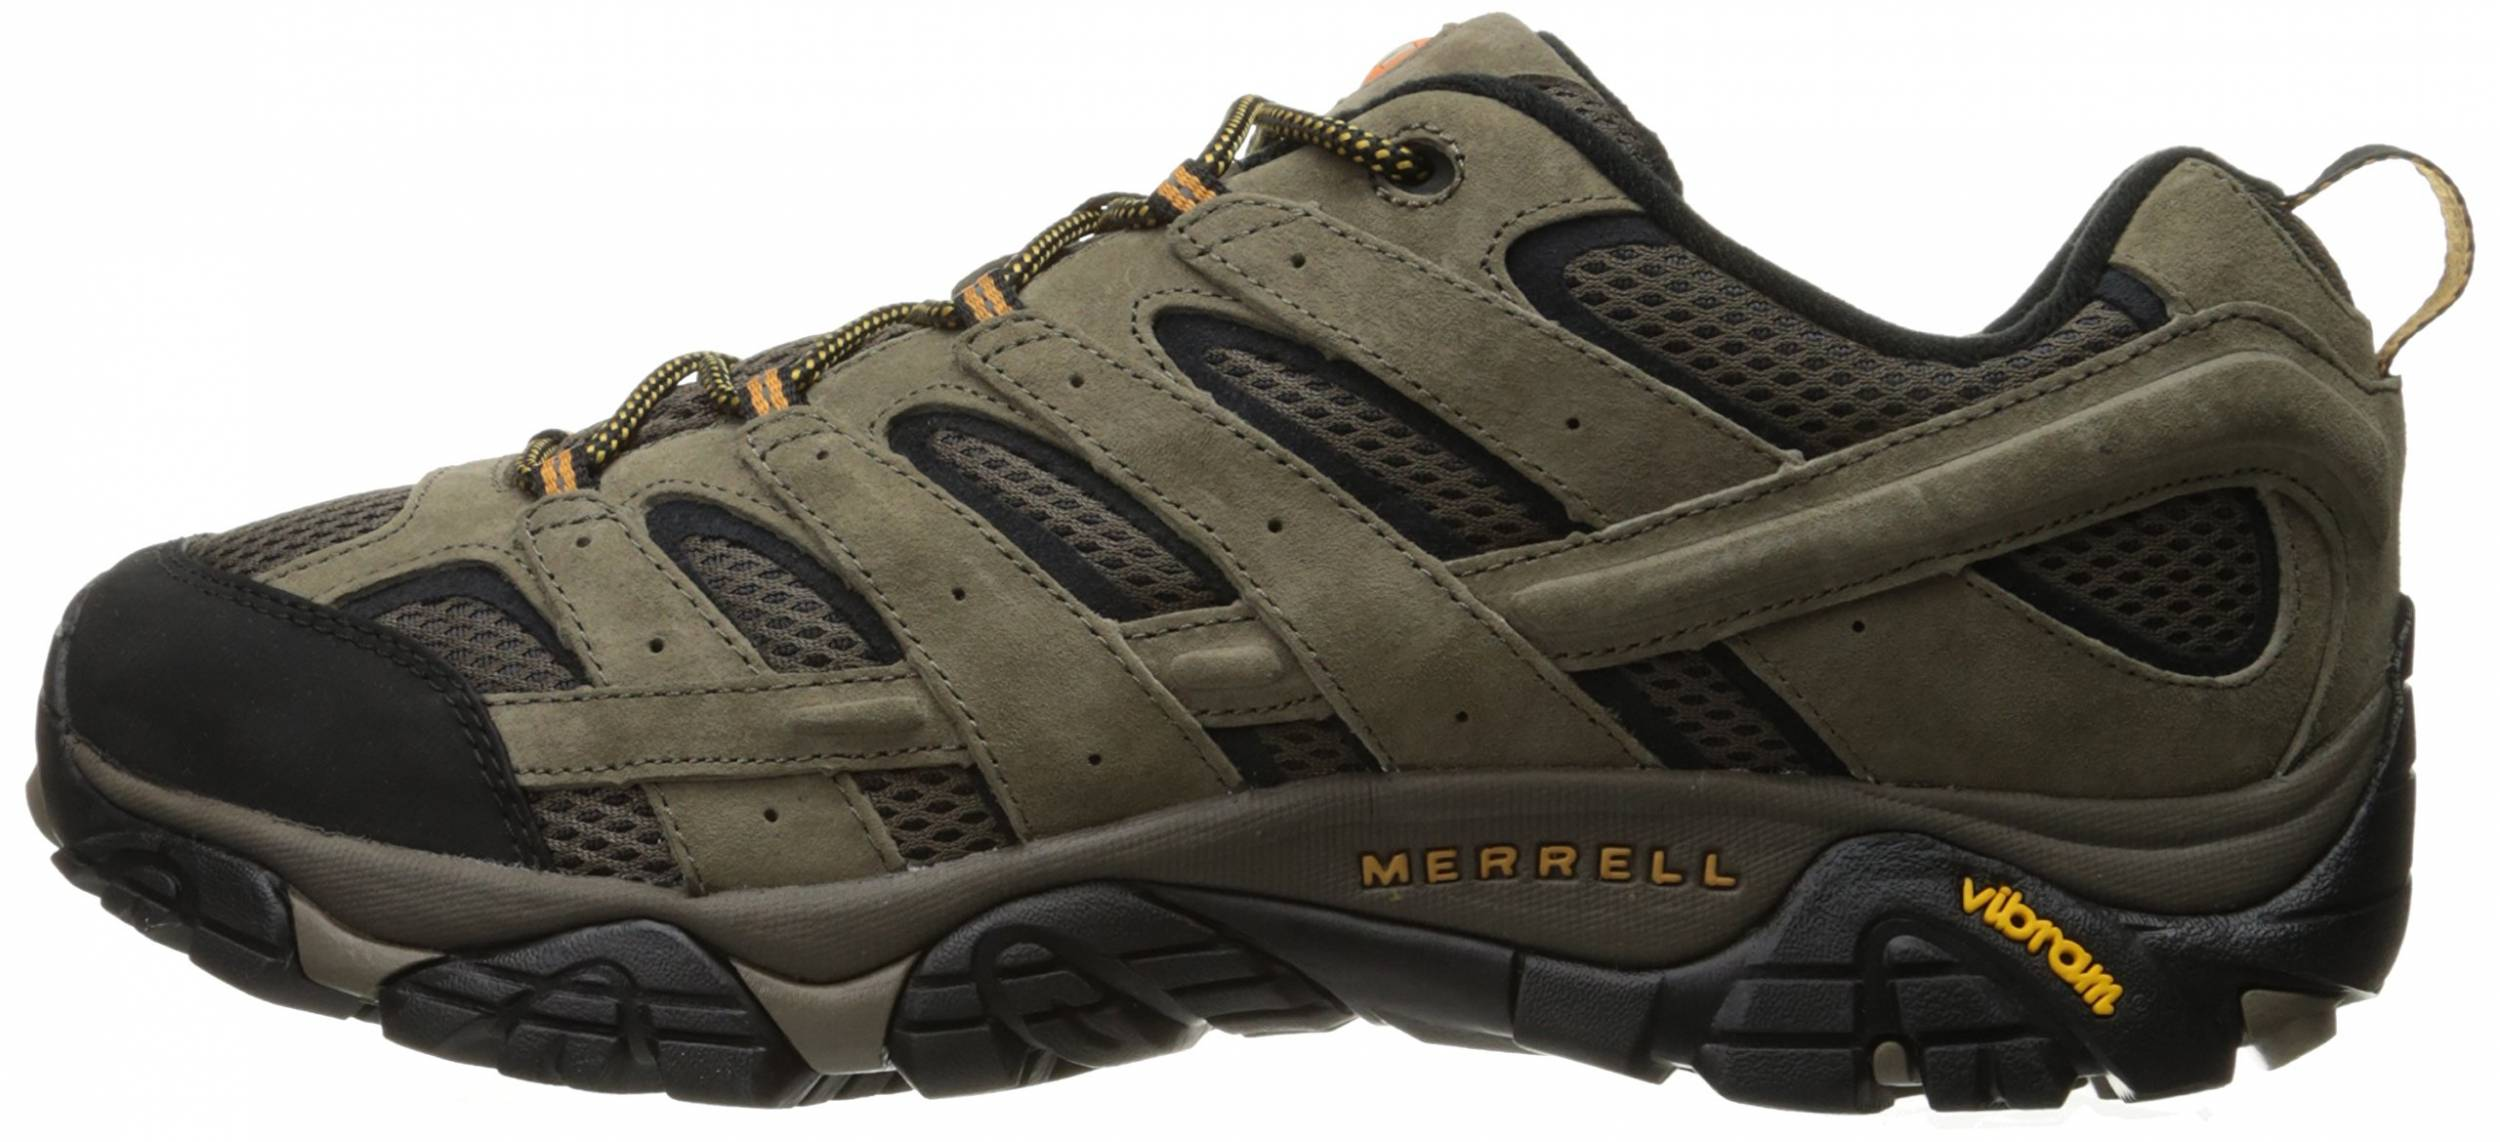 merrell moab ventilator size 10 down